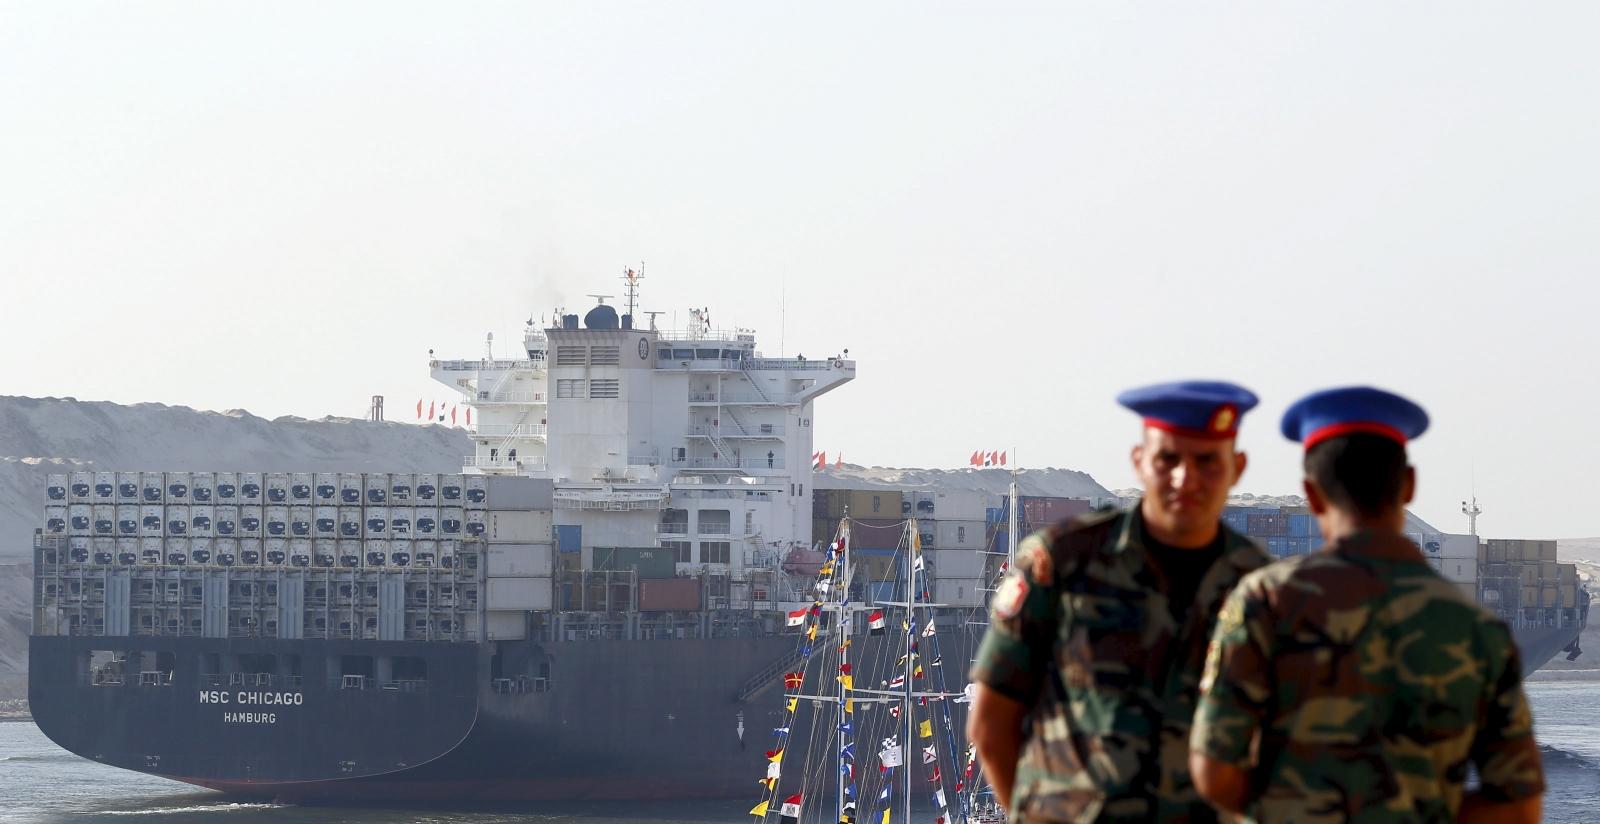 Egypt Suez Canal inauguration